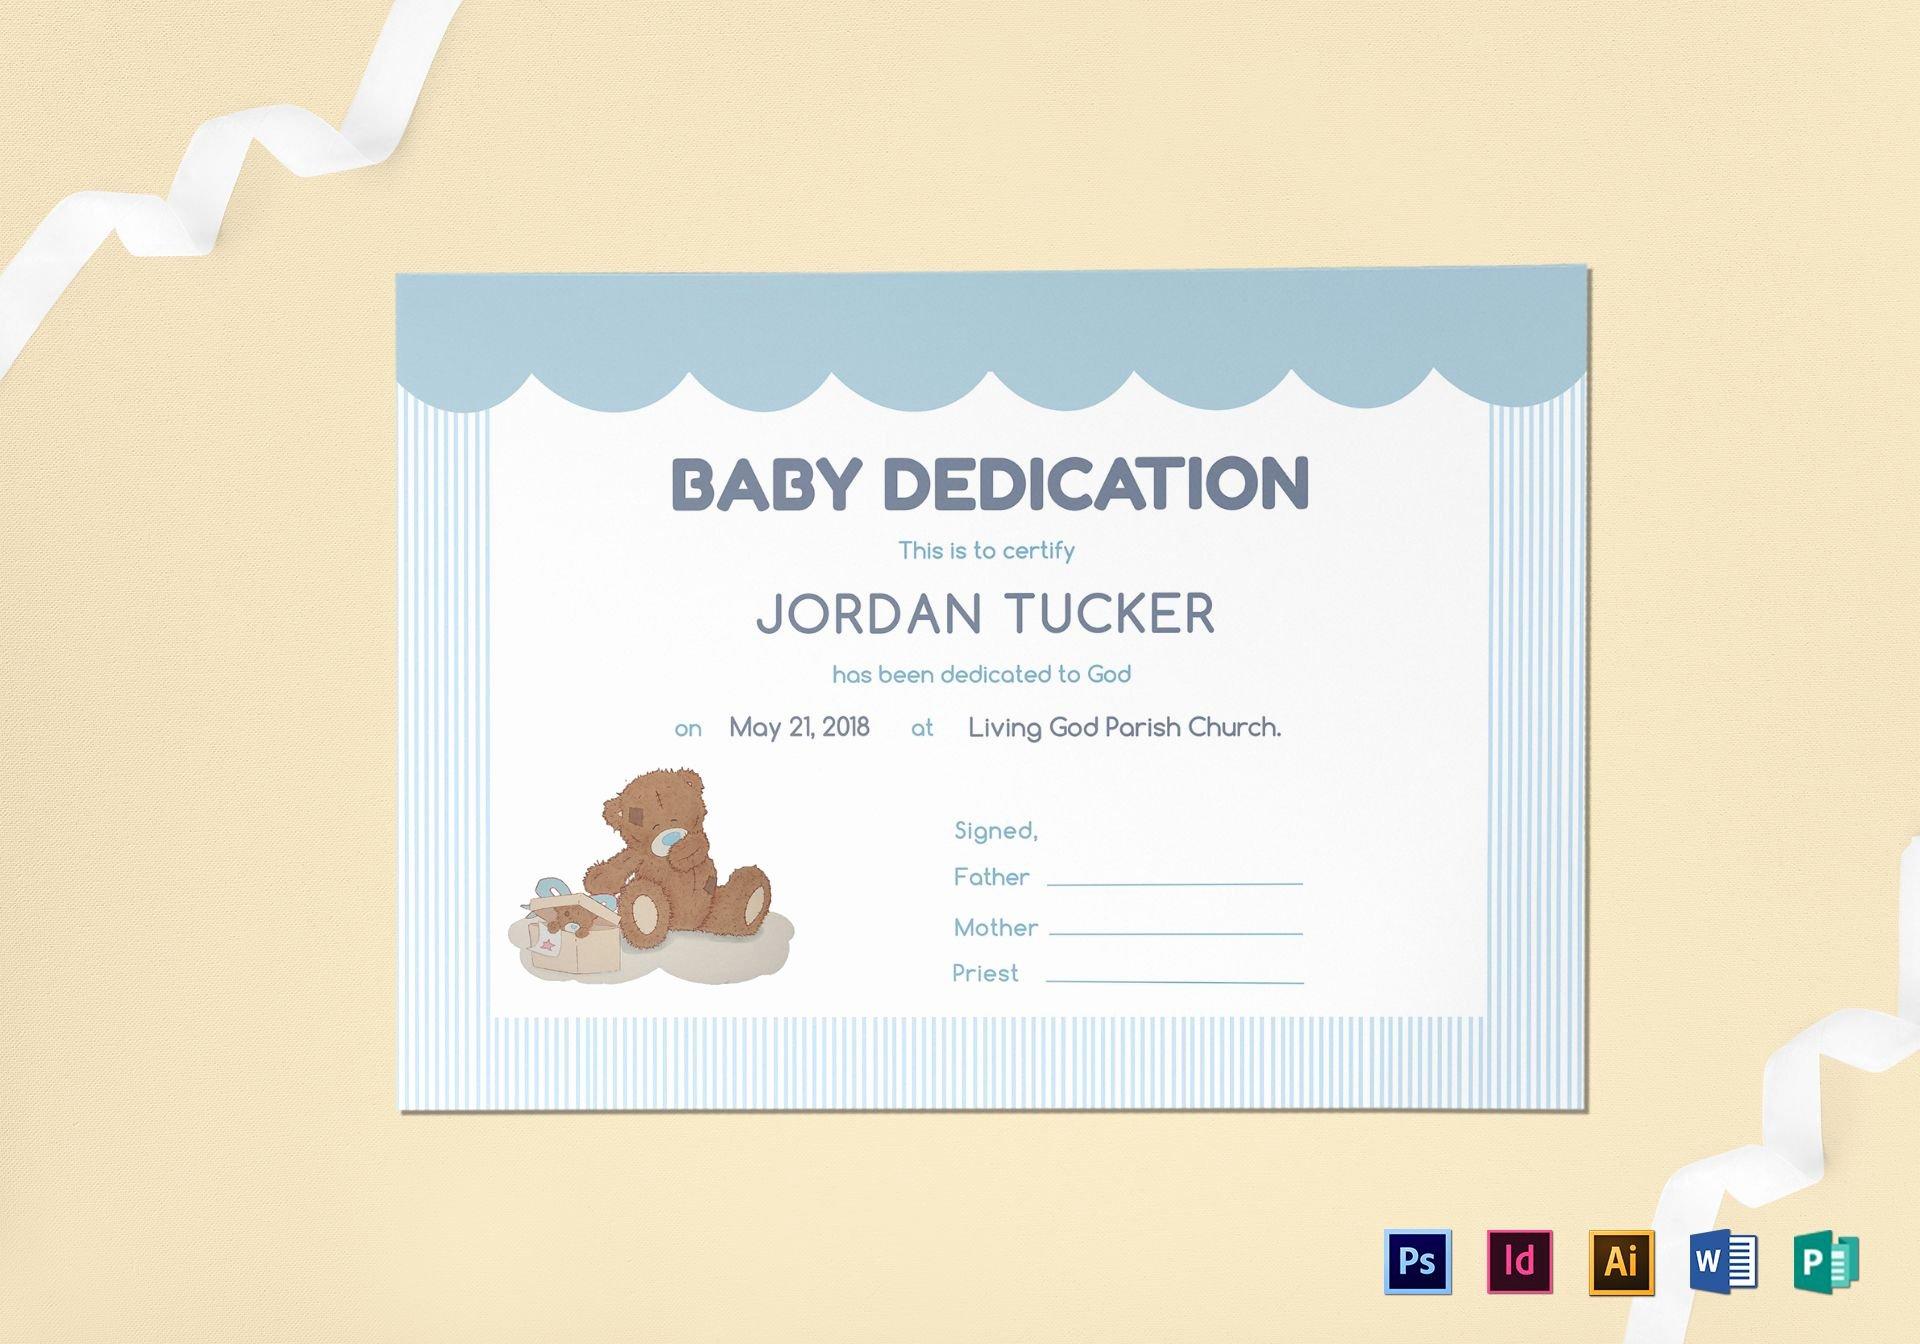 Baby Dedication Certificate Template Word Unique Baby Dedication Certificate Design Template In Psd Word